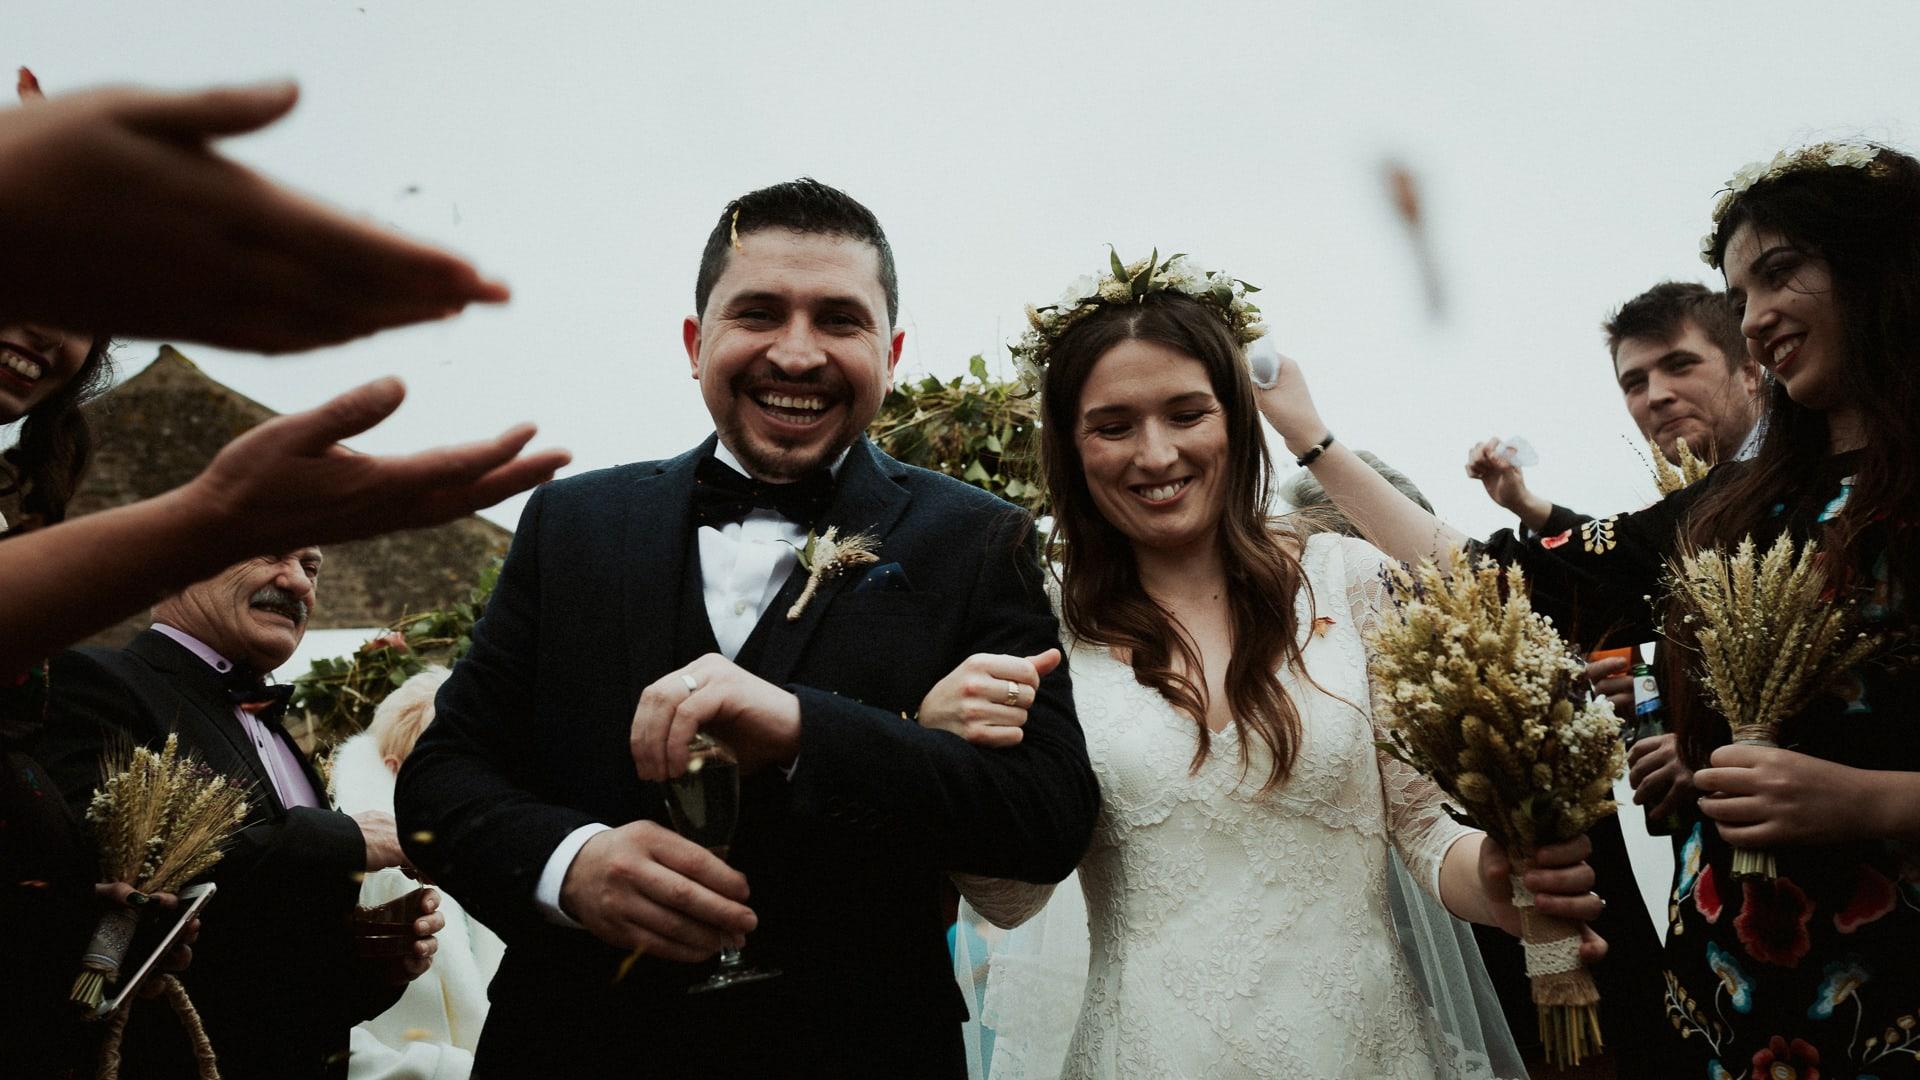 Edenbarn Wedding Photographer Lake District England 0056